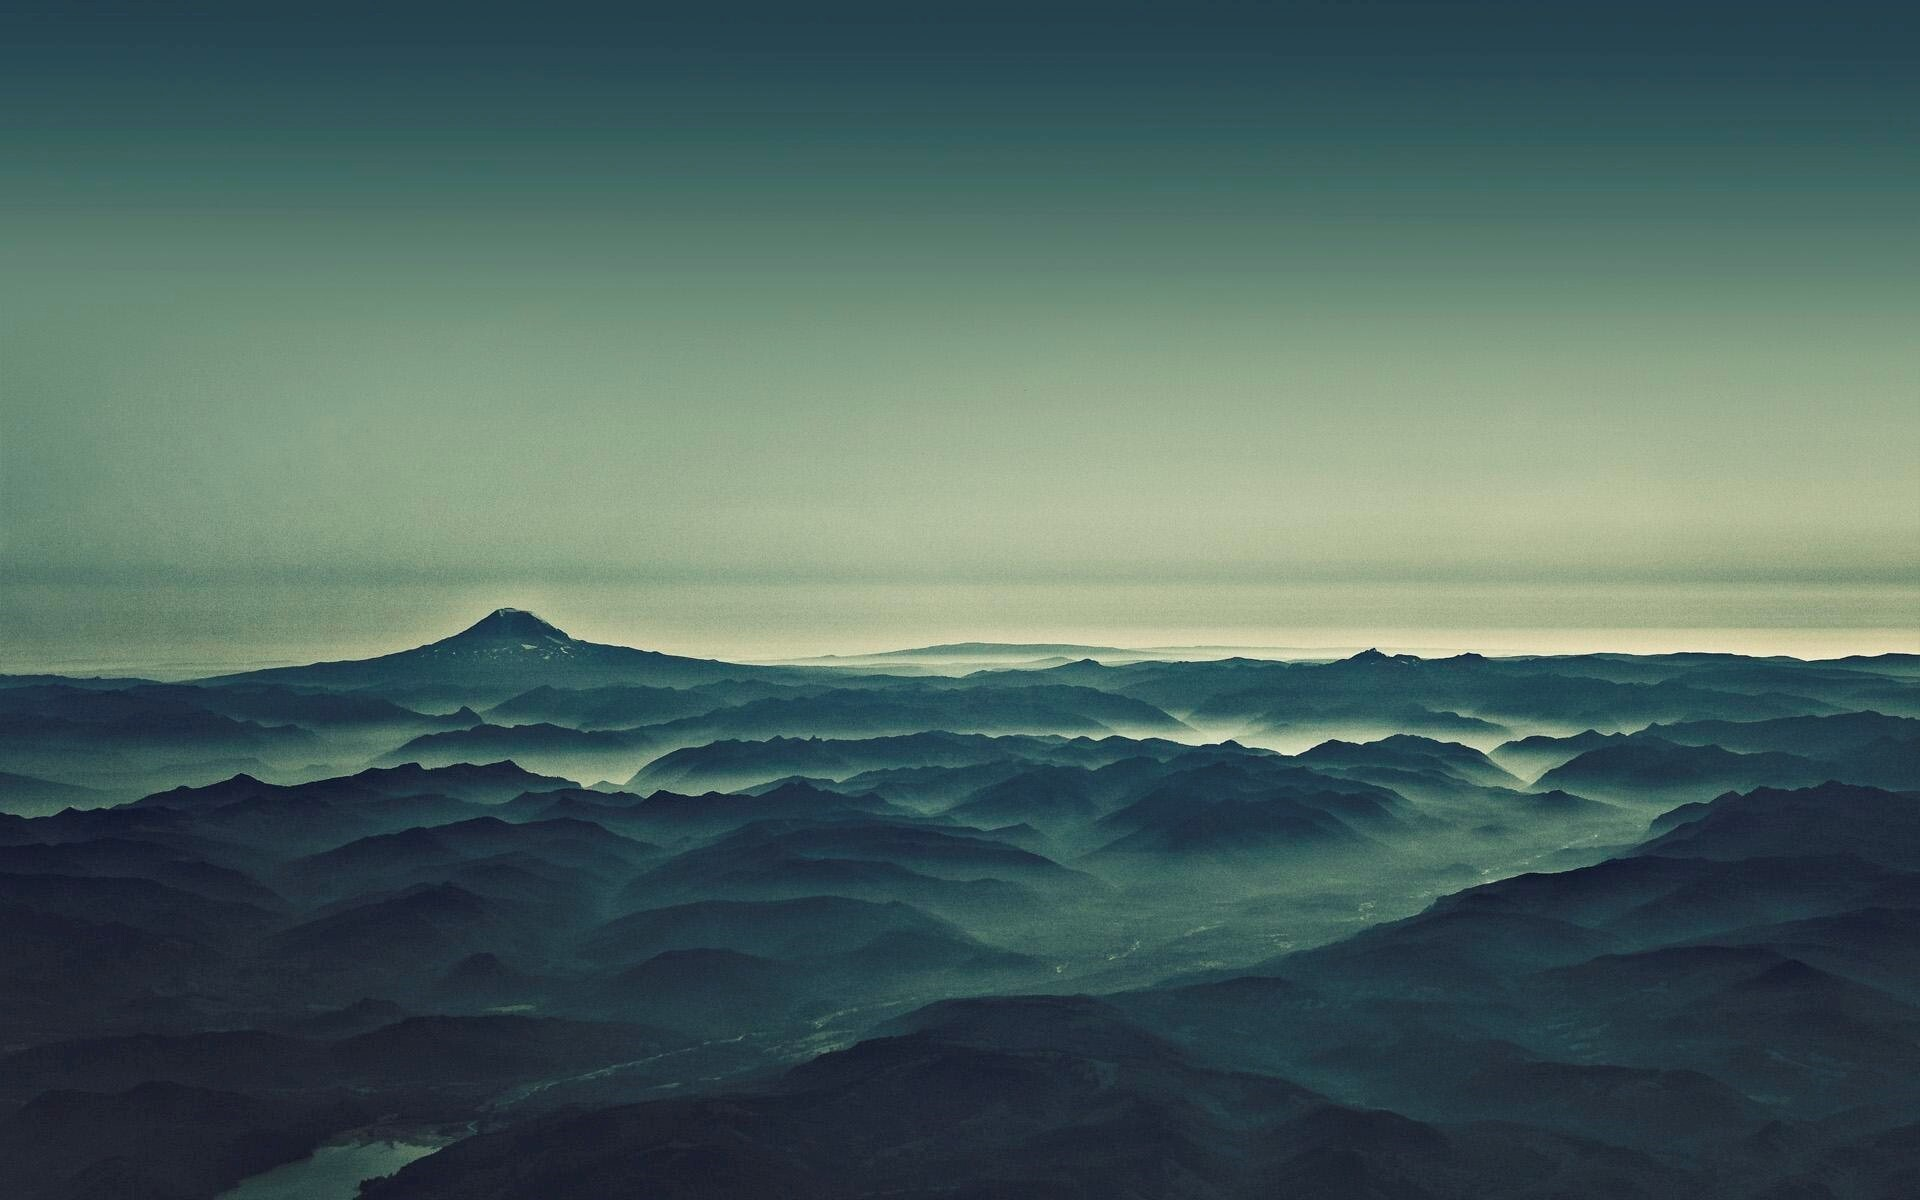 Fantastic Wallpaper Mountain Morning - Morning_Mist_Mountain_Image  Perfect Image Reference_526183.jpg